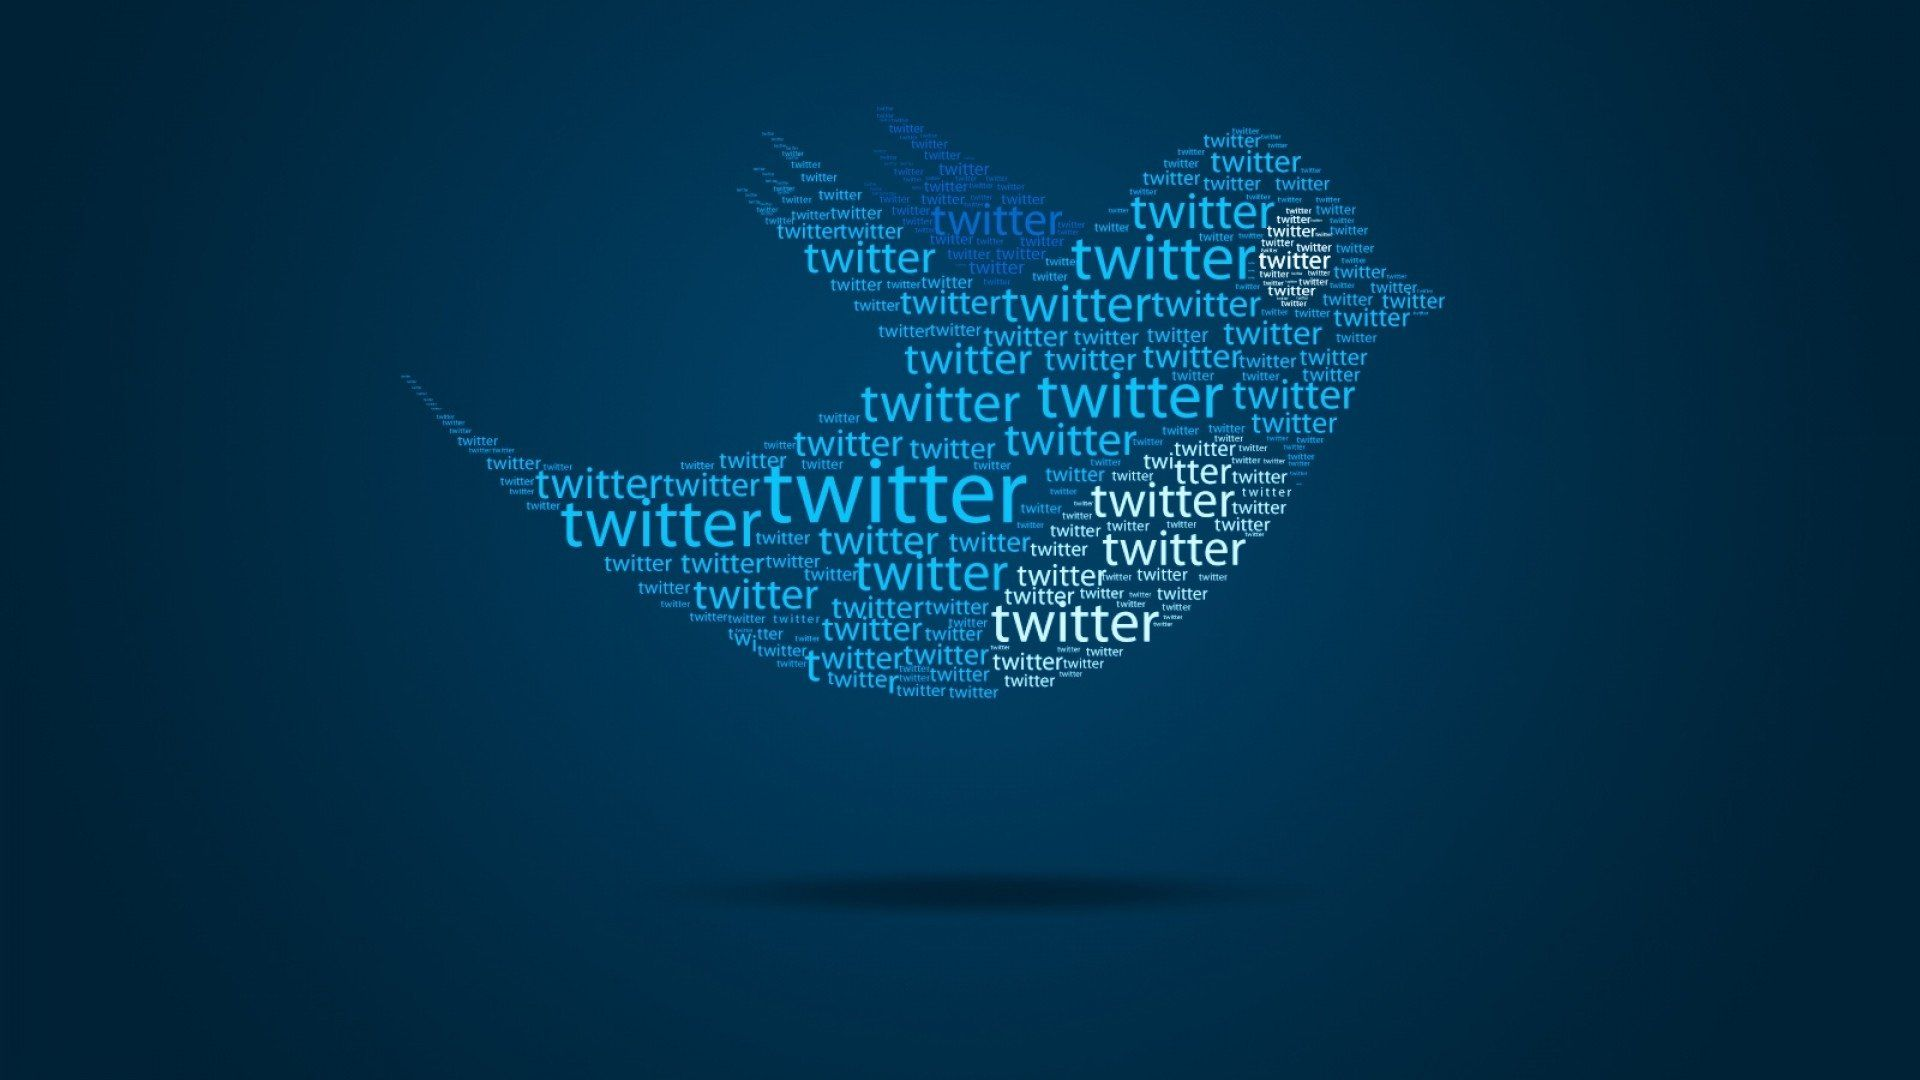 Twitter Wallpapers   Top Twitter Backgrounds   WallpaperAccess 1920x1080